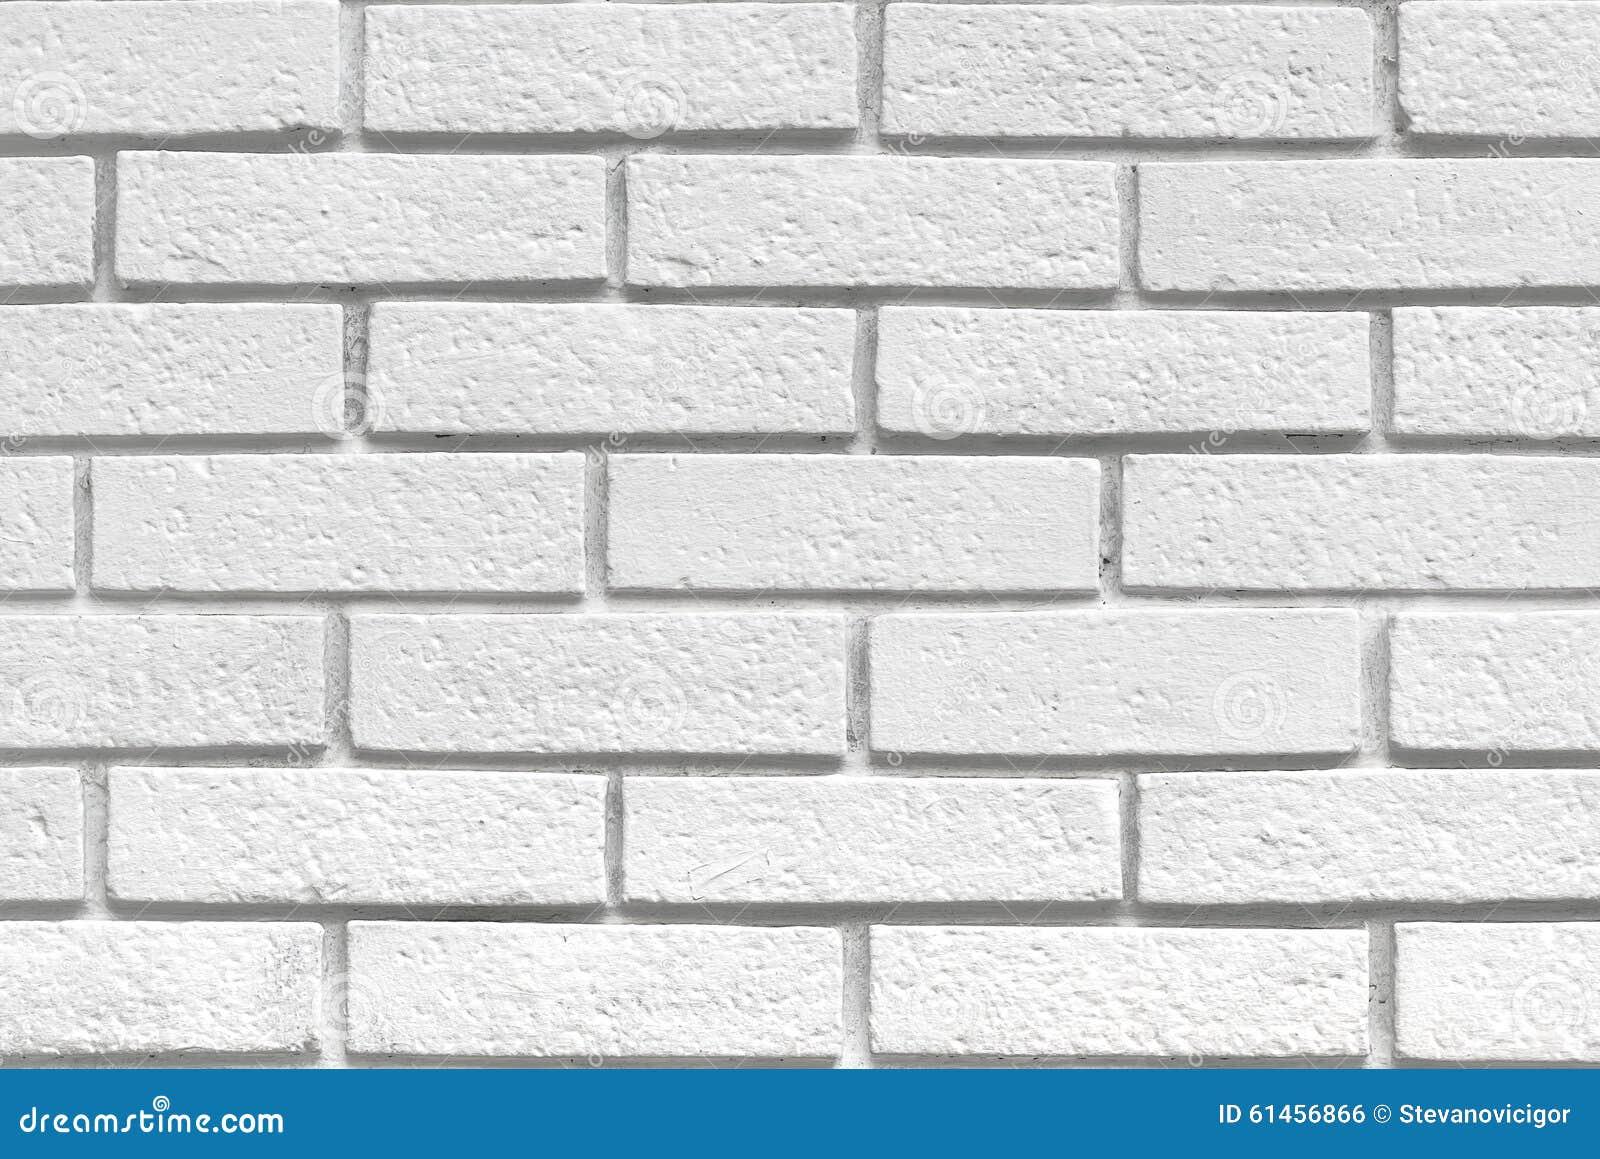 White bricks texture stock photo image 61456866 for Exterior brick design patterns